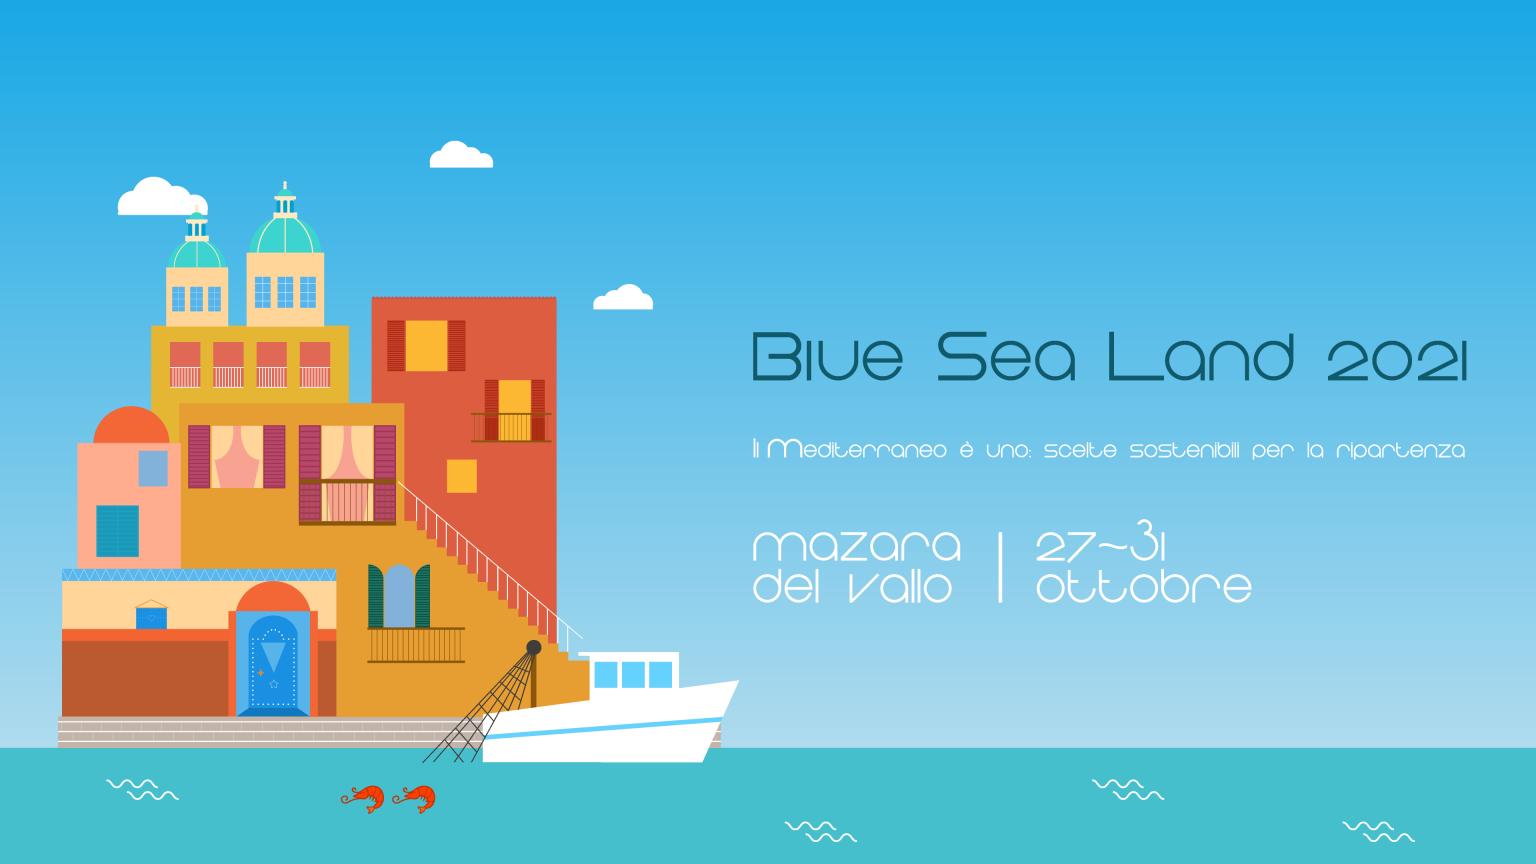 blue sea land 2021